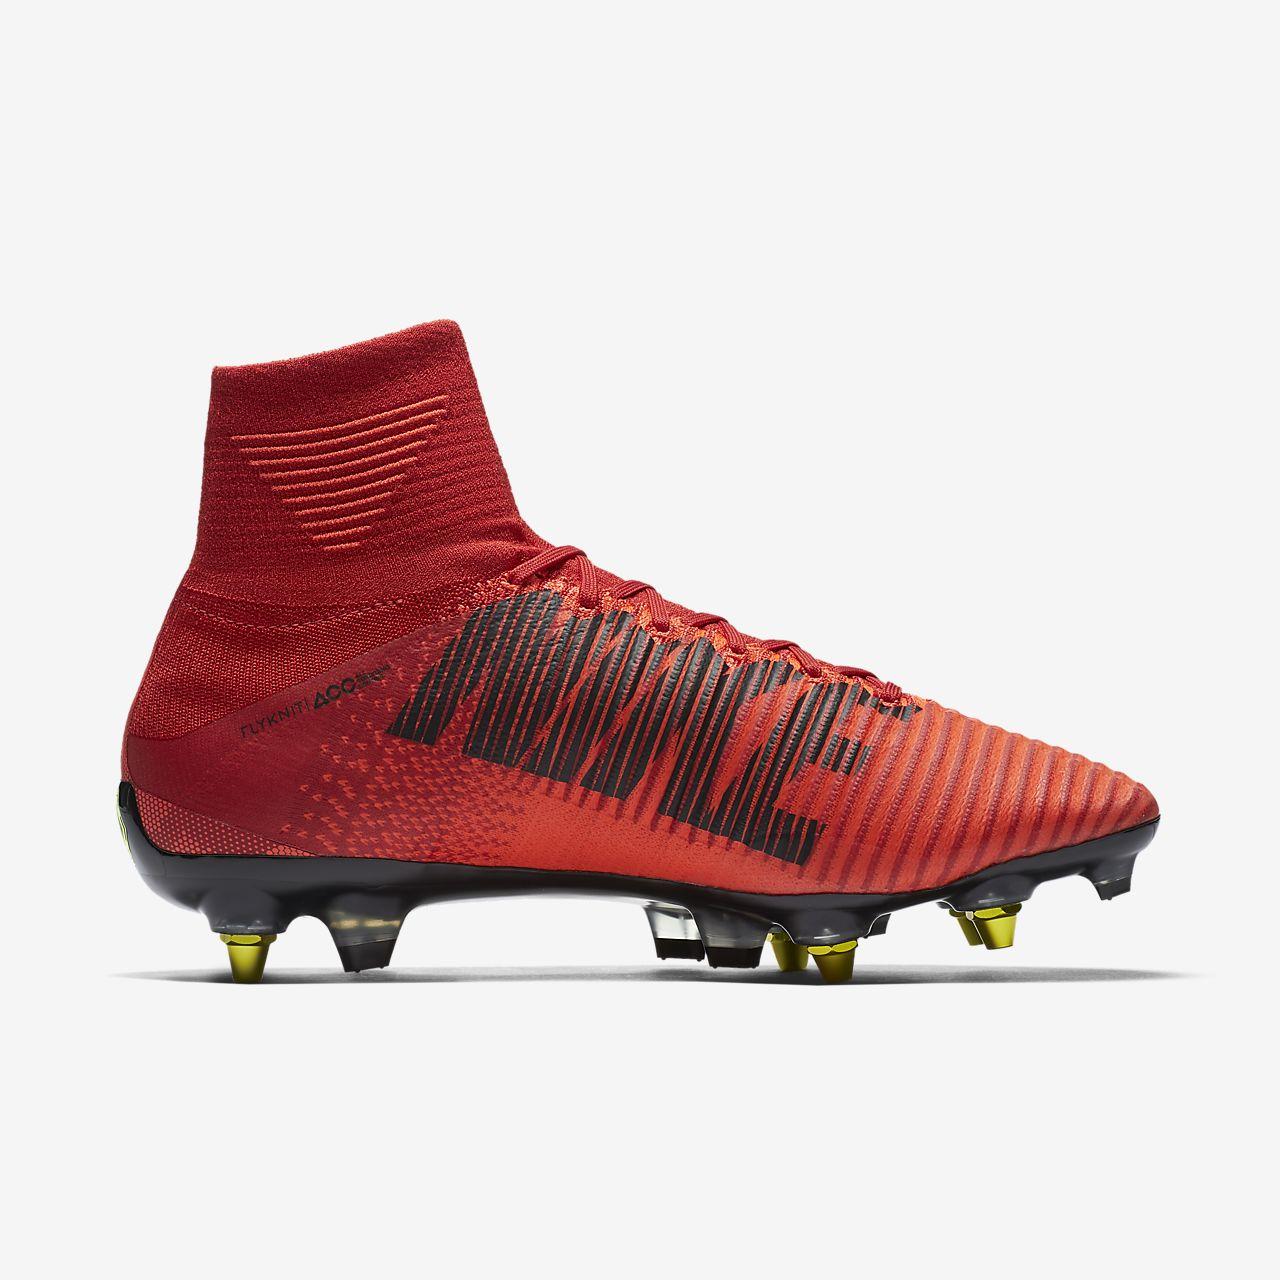 ... Nike Mercurial Superfly V Dynamic Fit SG-PRO Anti-Clog Soft-Ground  Soccer